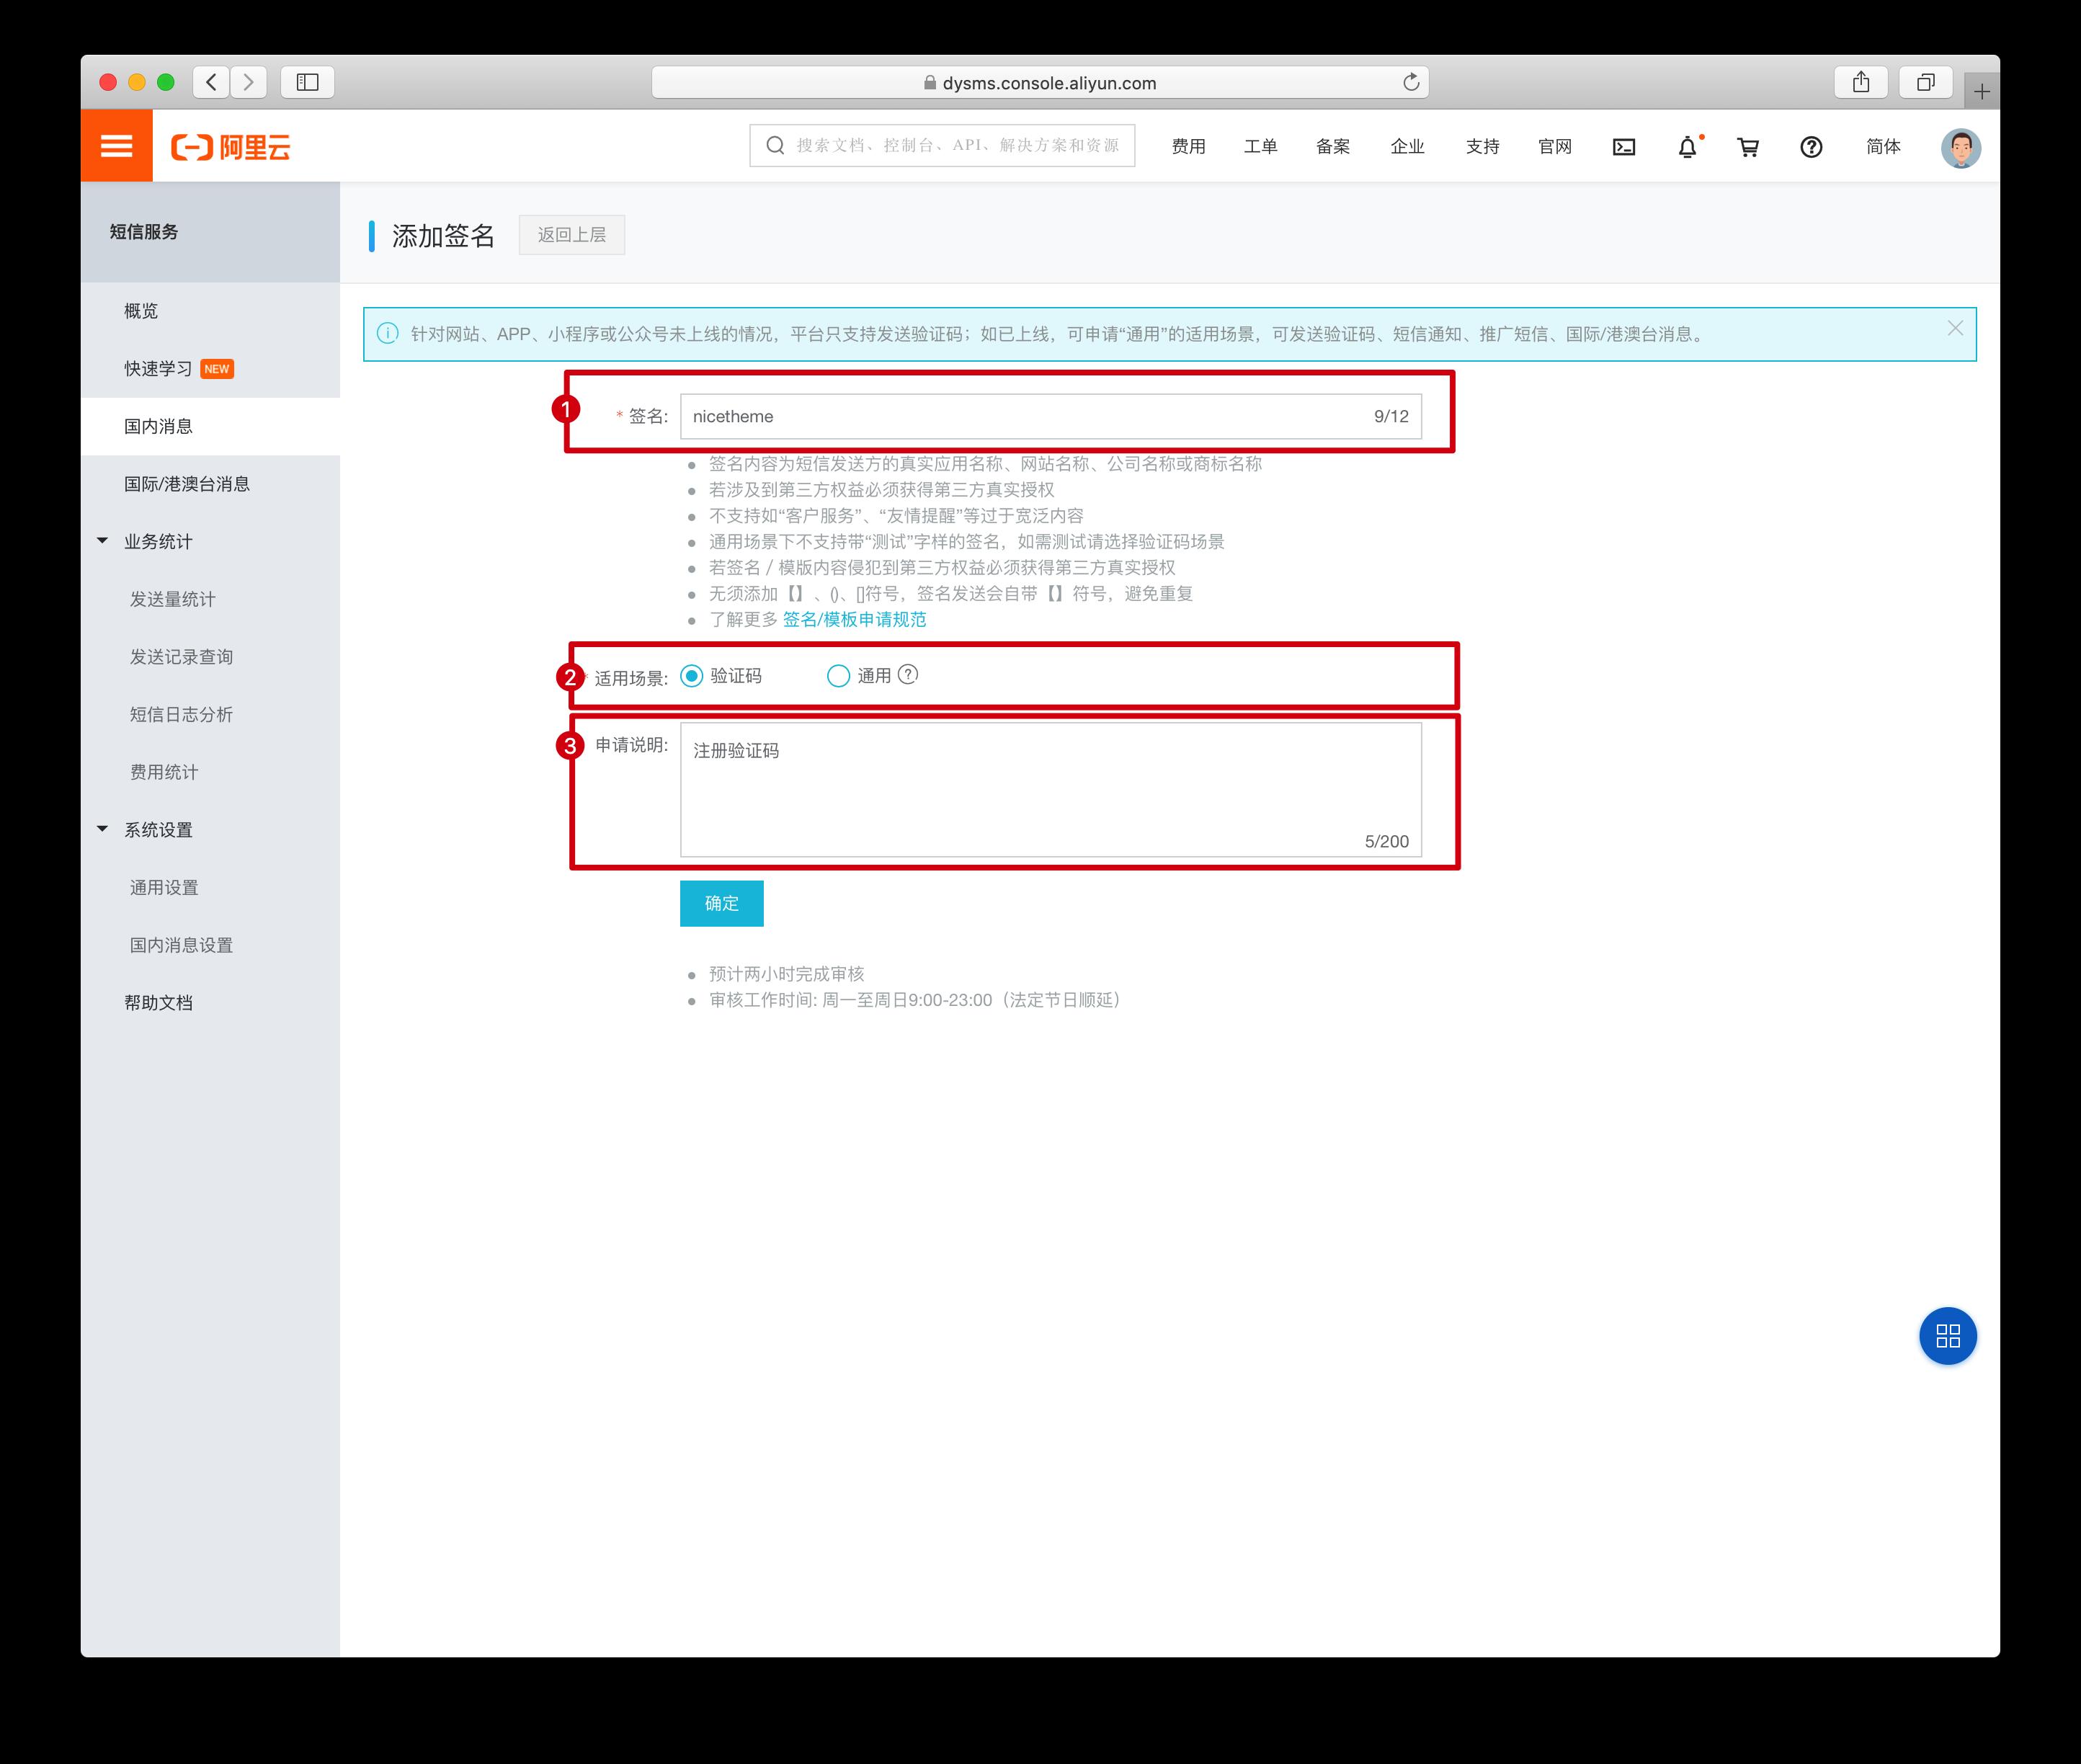 WordPress主题如何使用阿里云短信服务设置教程-nicetheme